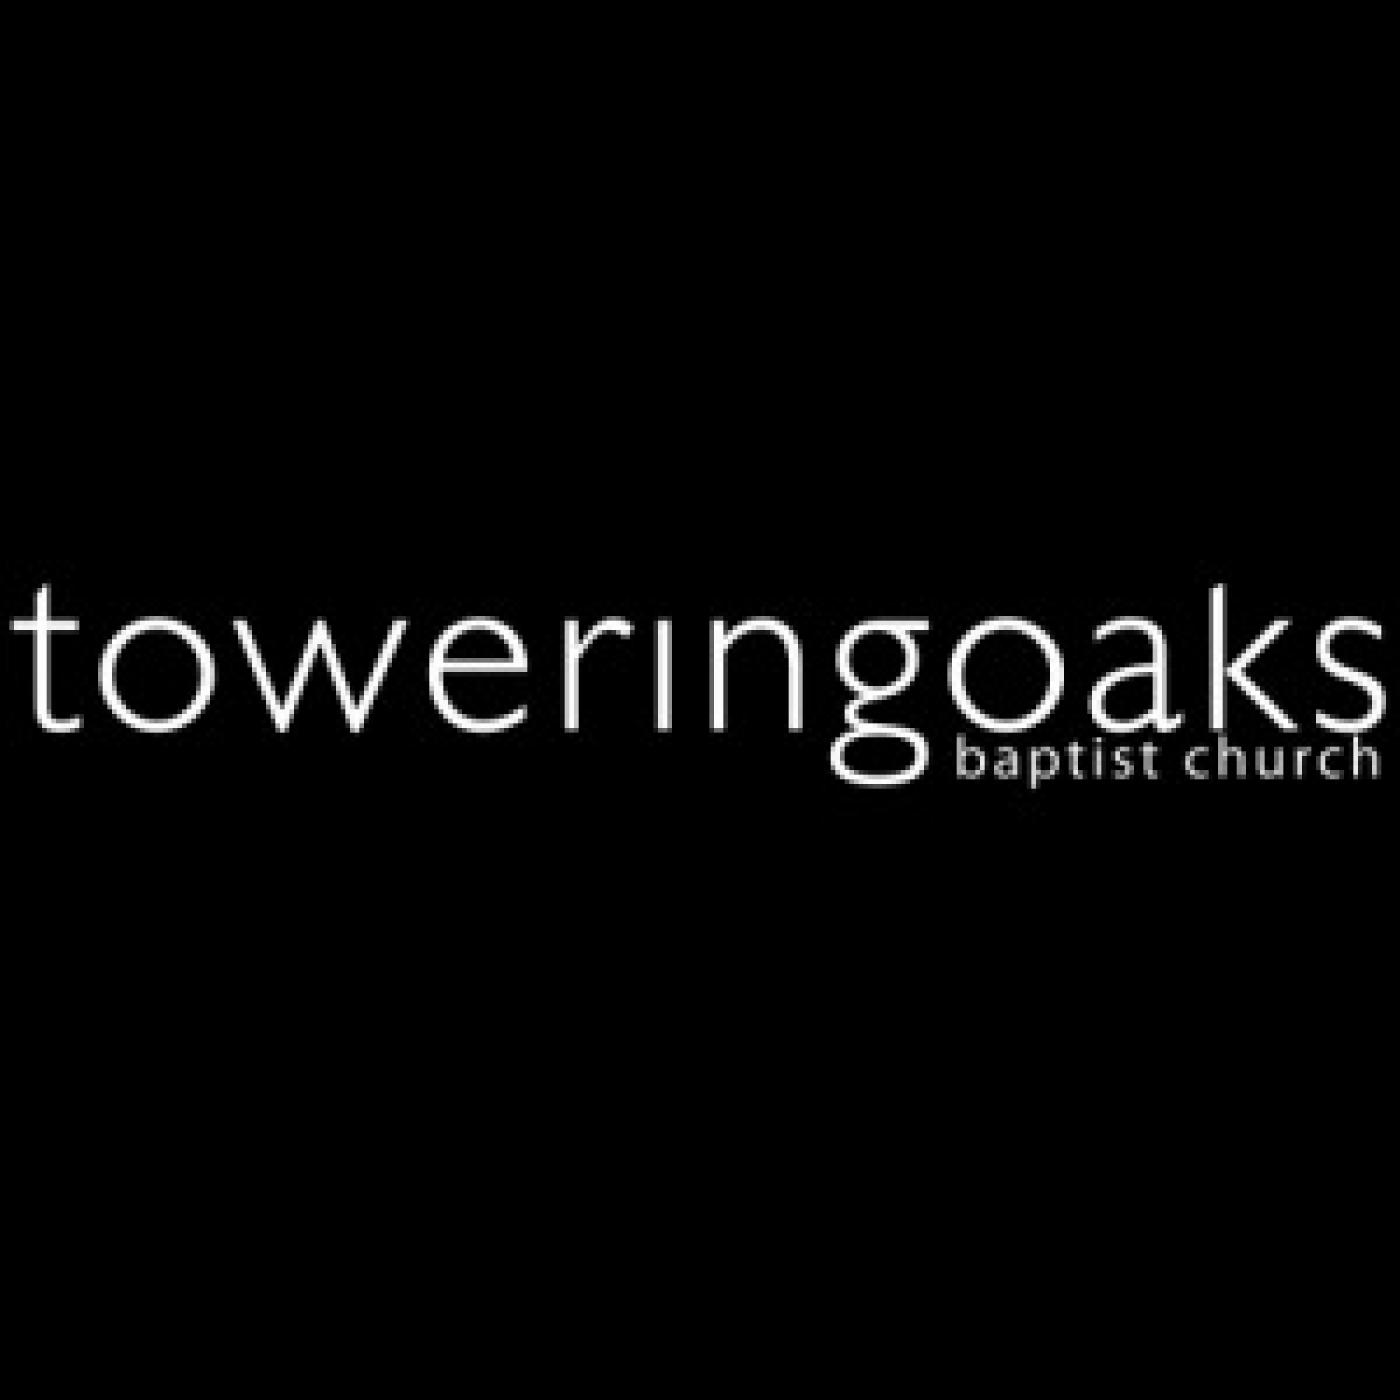 Towering Oaks